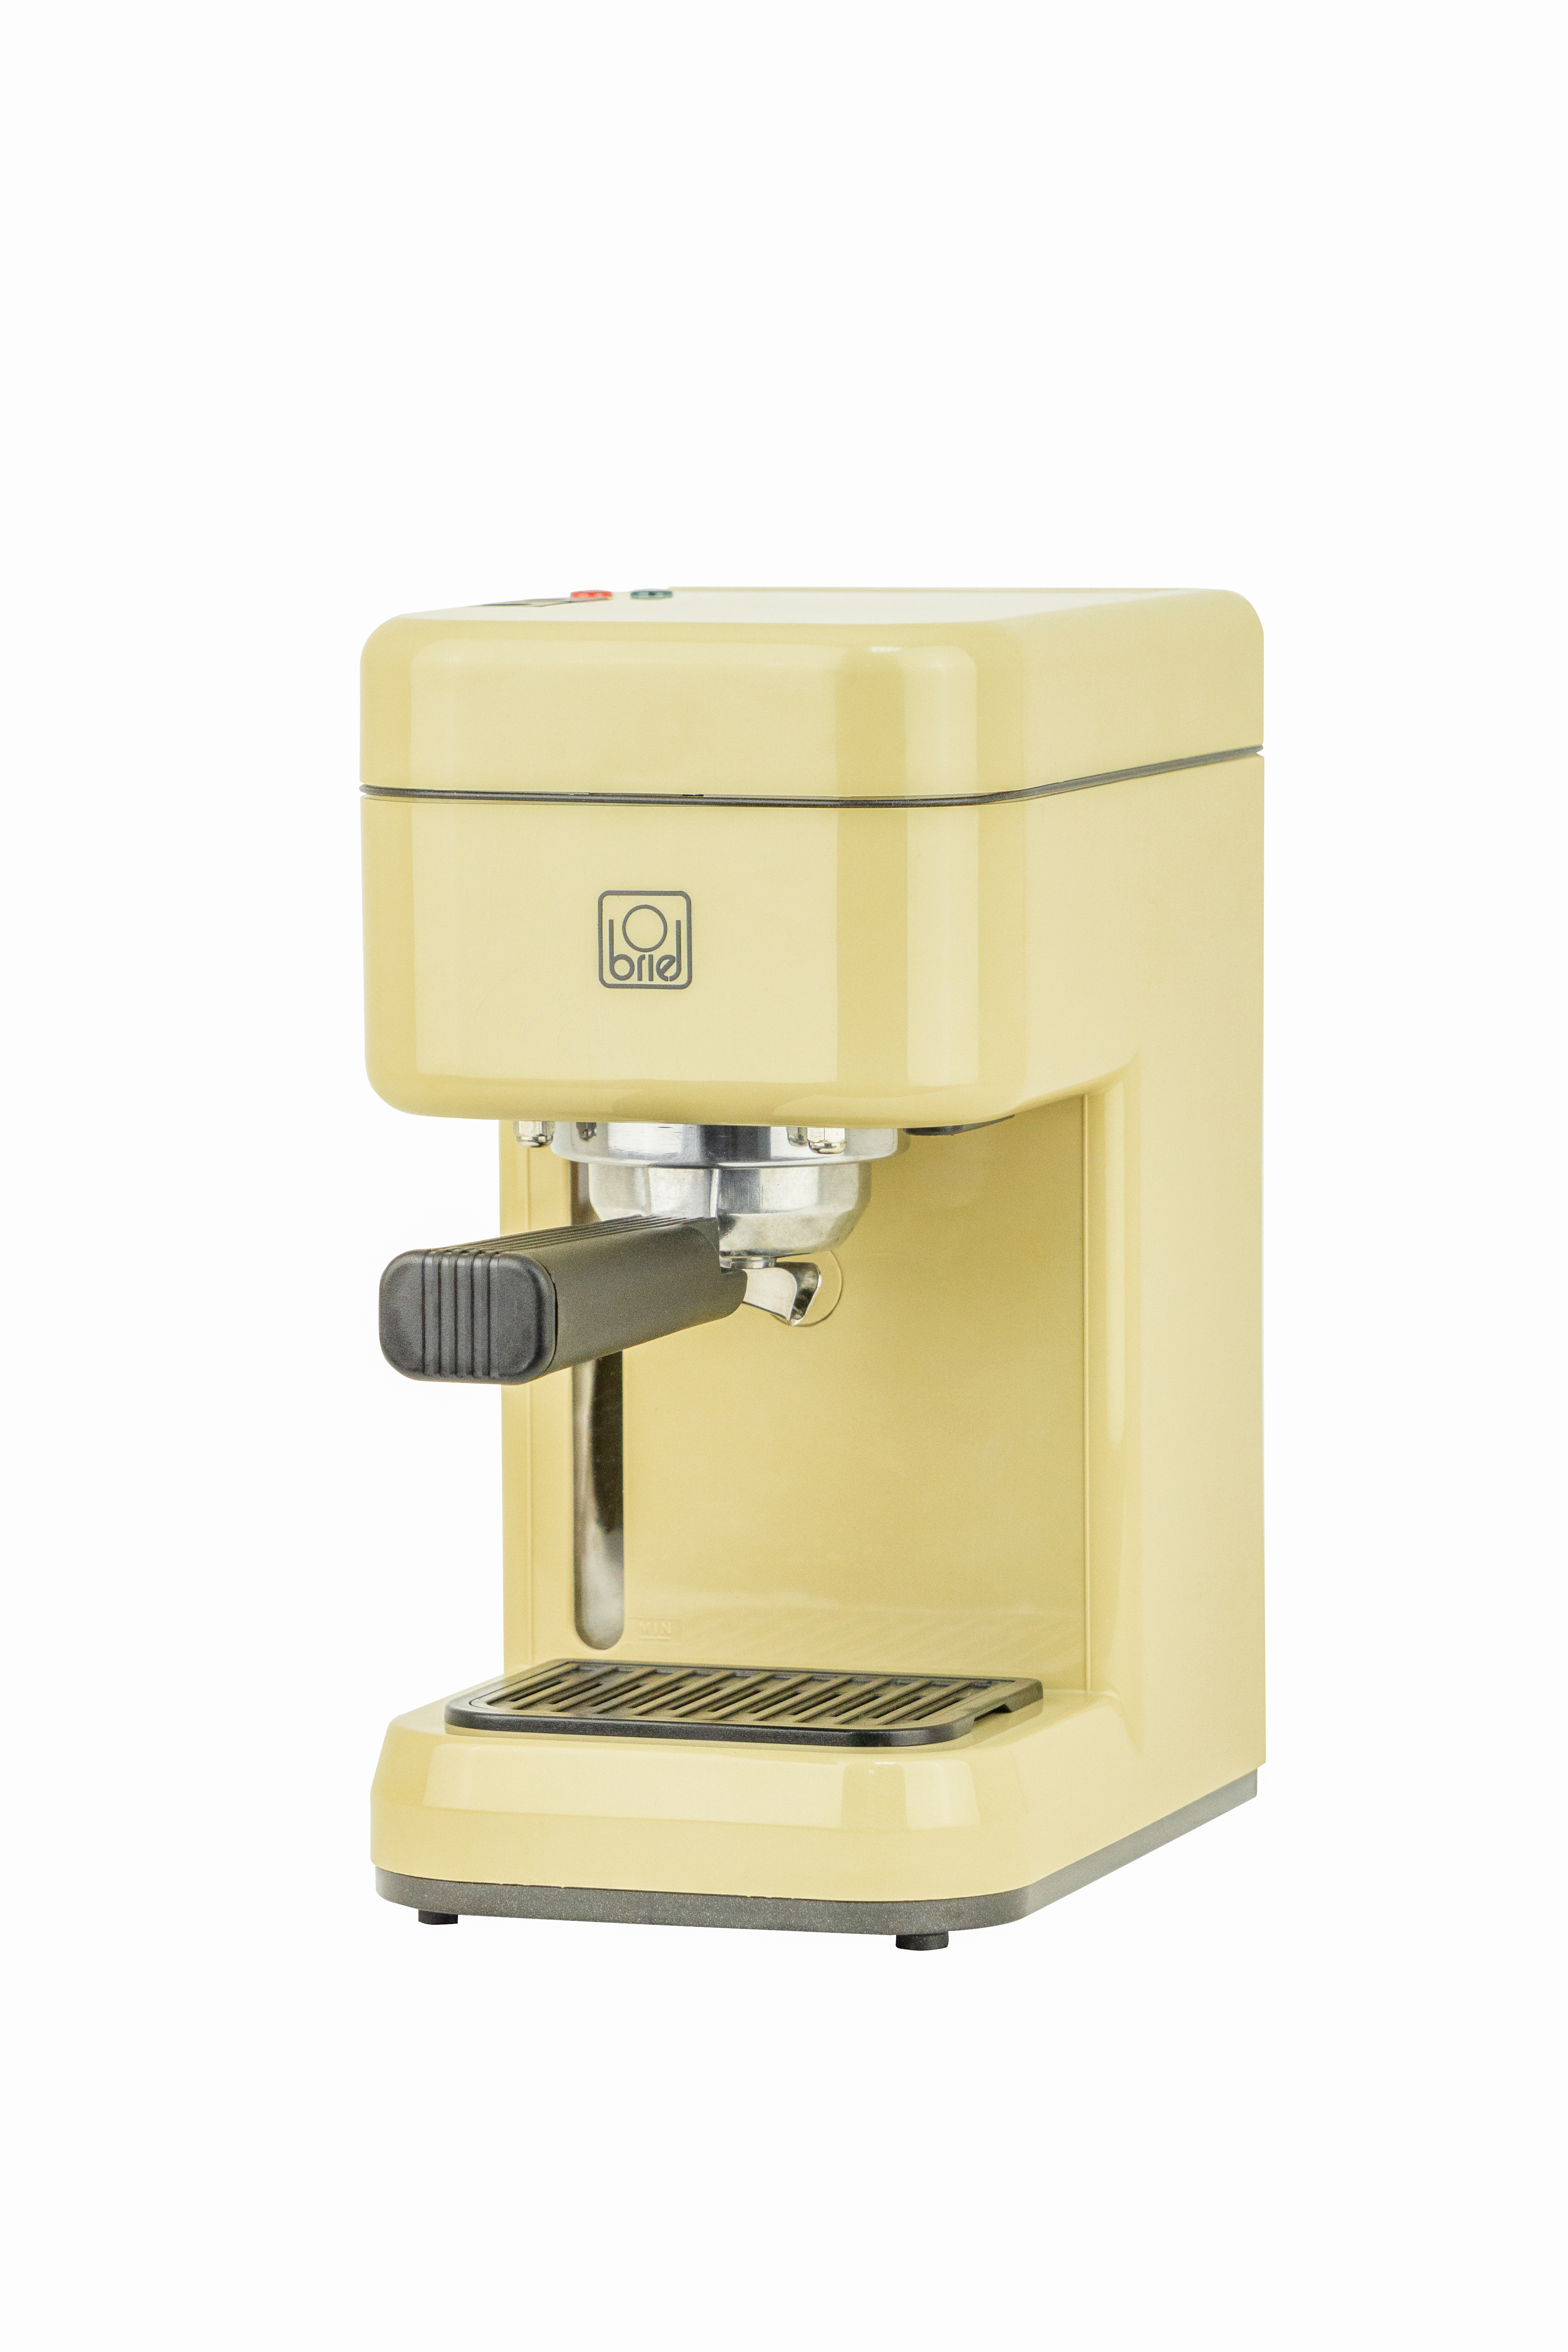 BRIEL B14 MANUAL ESPRESSO MACHINE - YELLOW